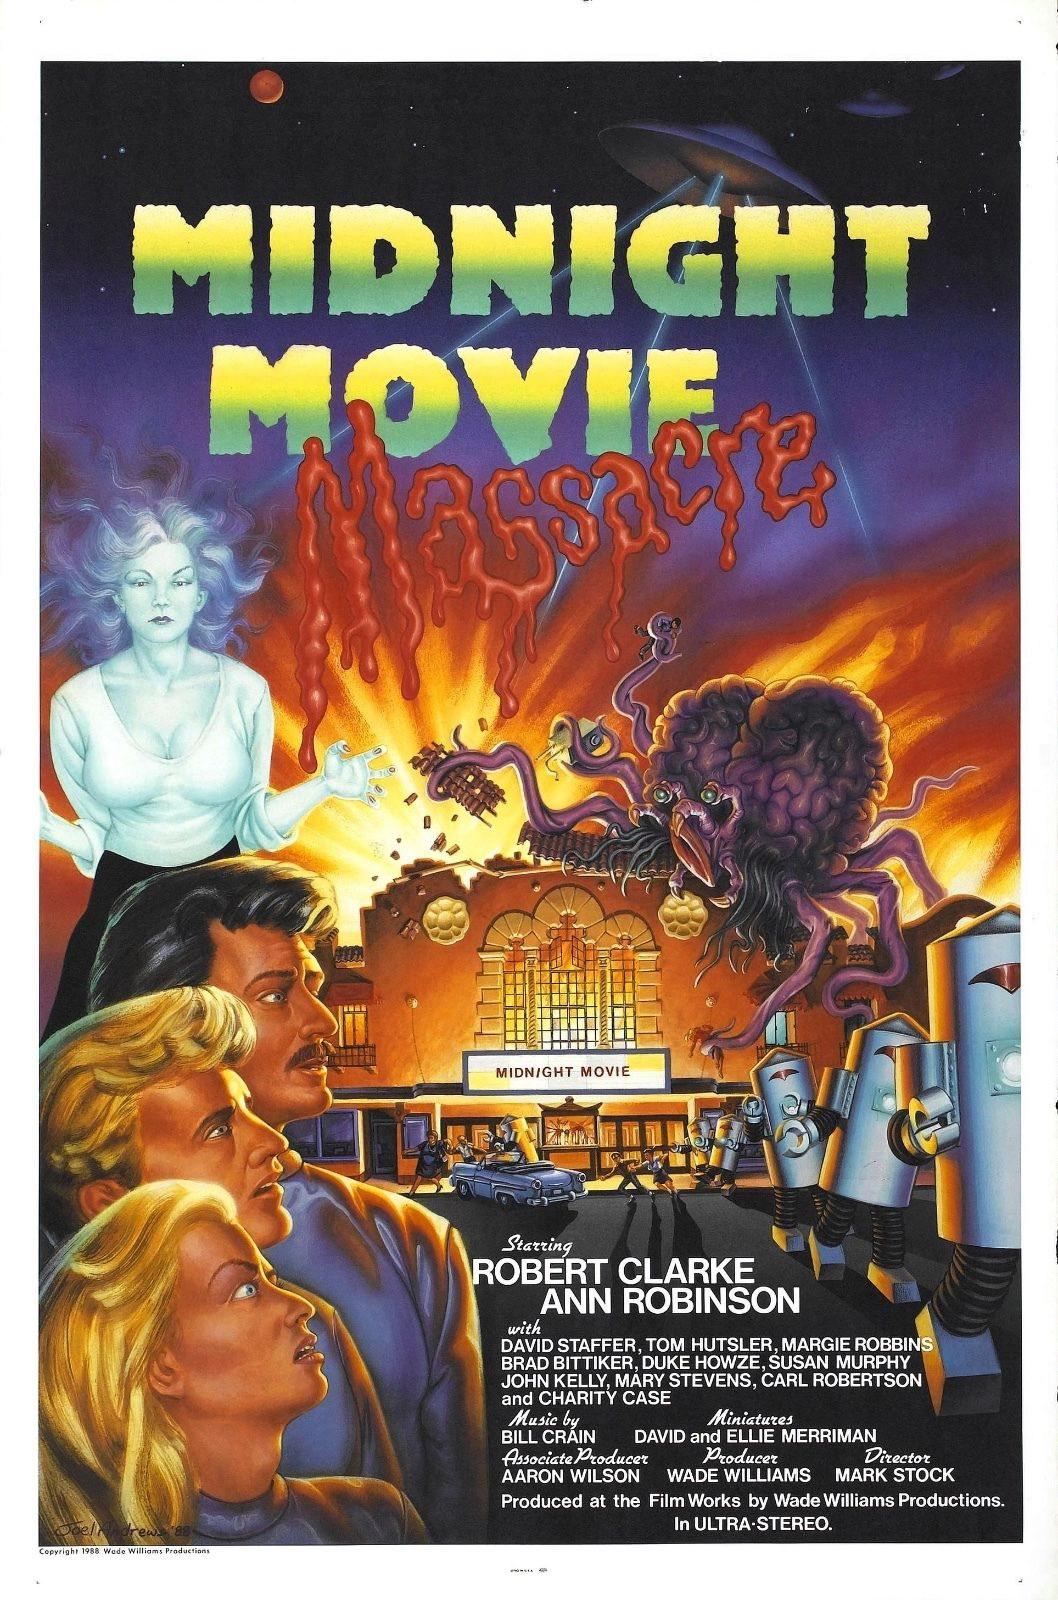 73897 Midnight Movie Massacre Movie 1988 Comedy Wall Print Poster Affiche